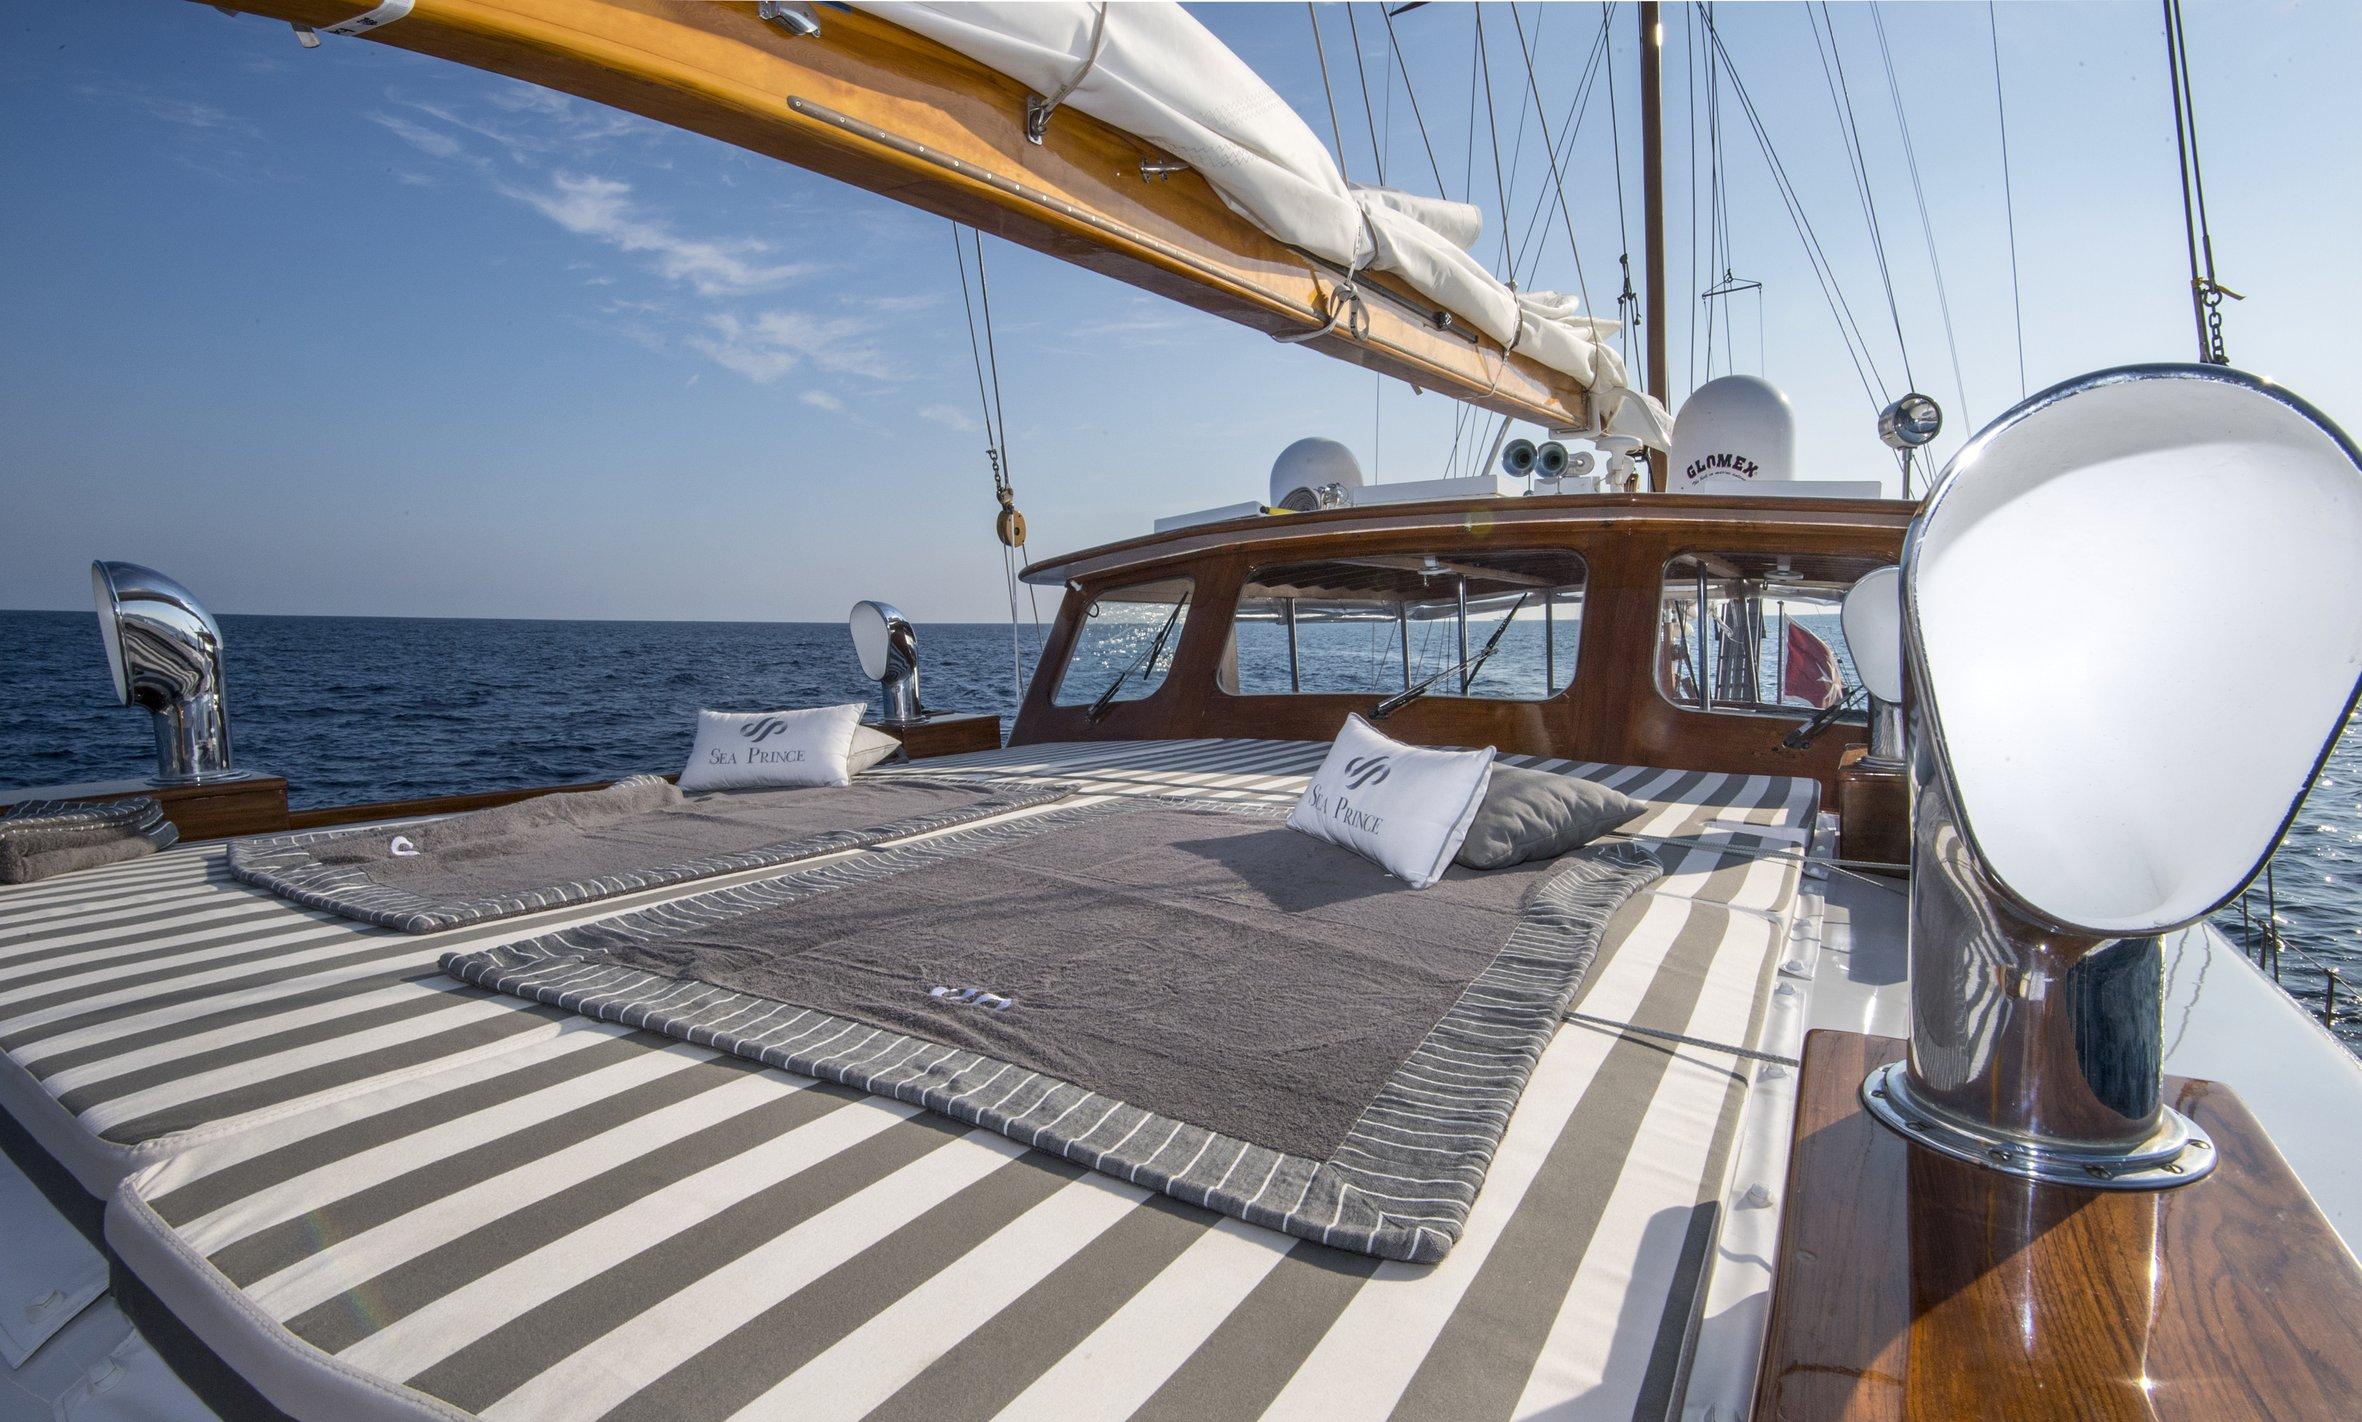 seaprince_deck474_phBluePassion.jpg